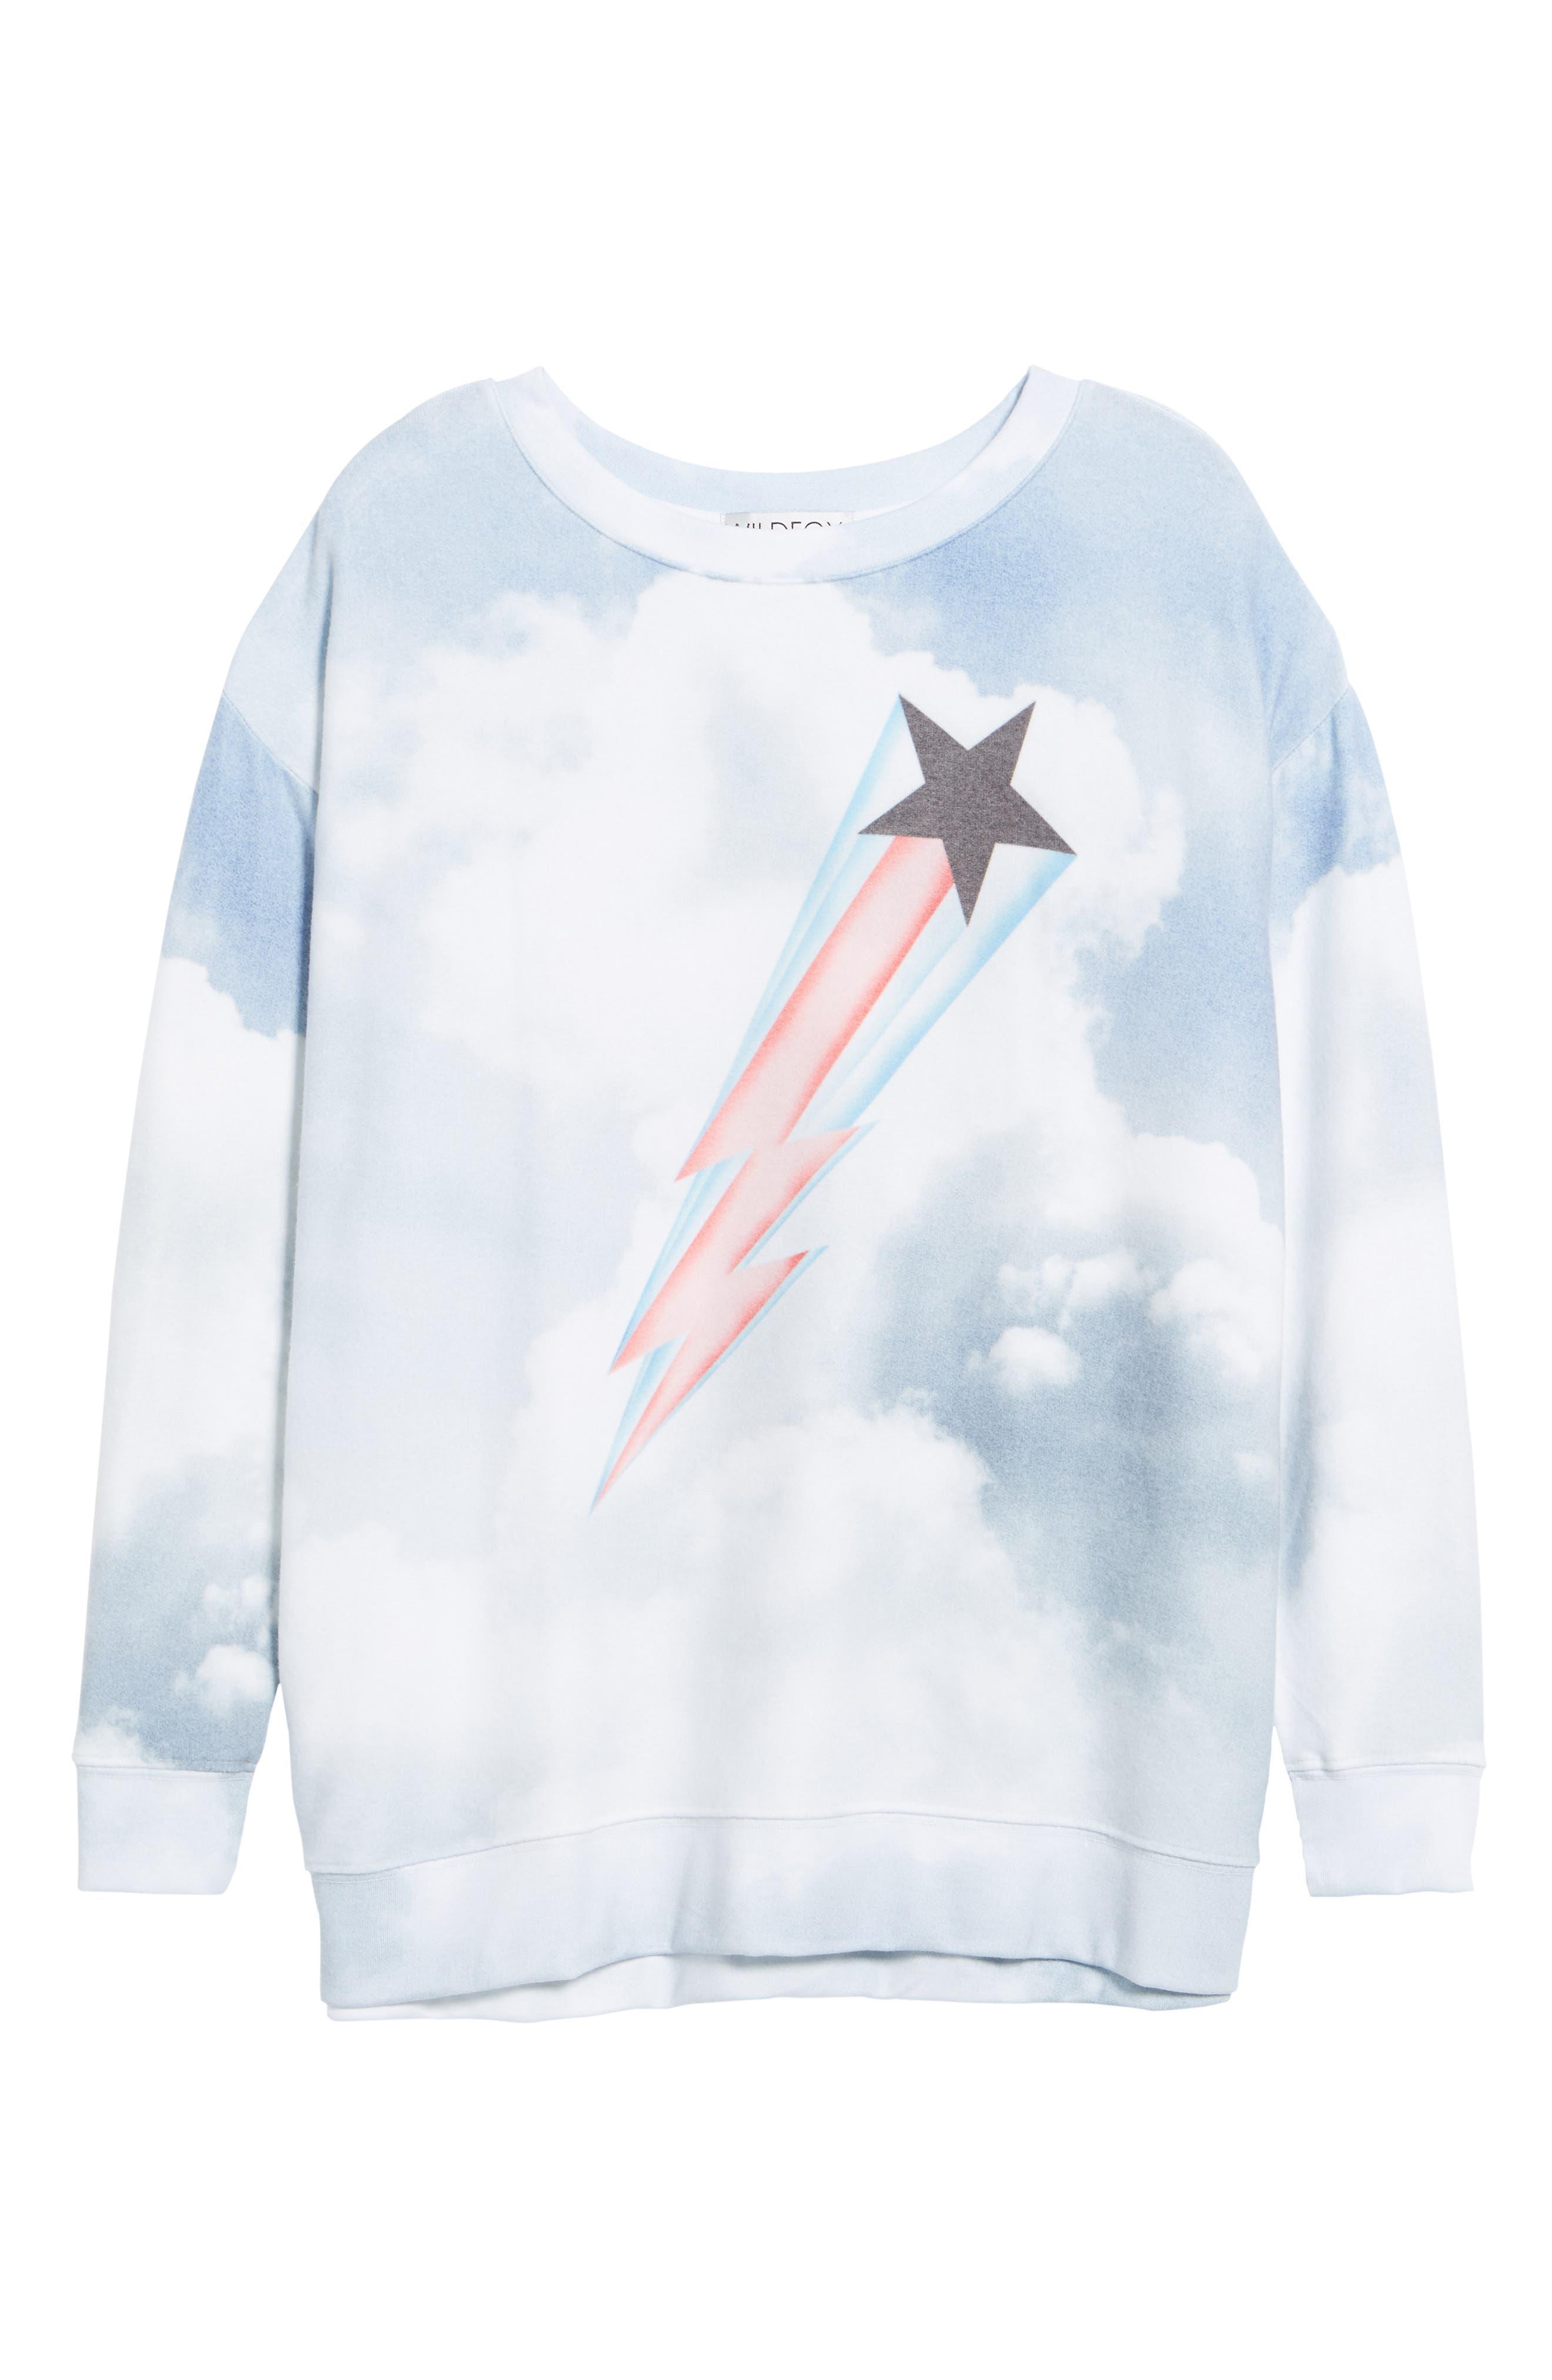 Heavens Roadtrip Sweatshirt,                             Alternate thumbnail 6, color,                             Multi